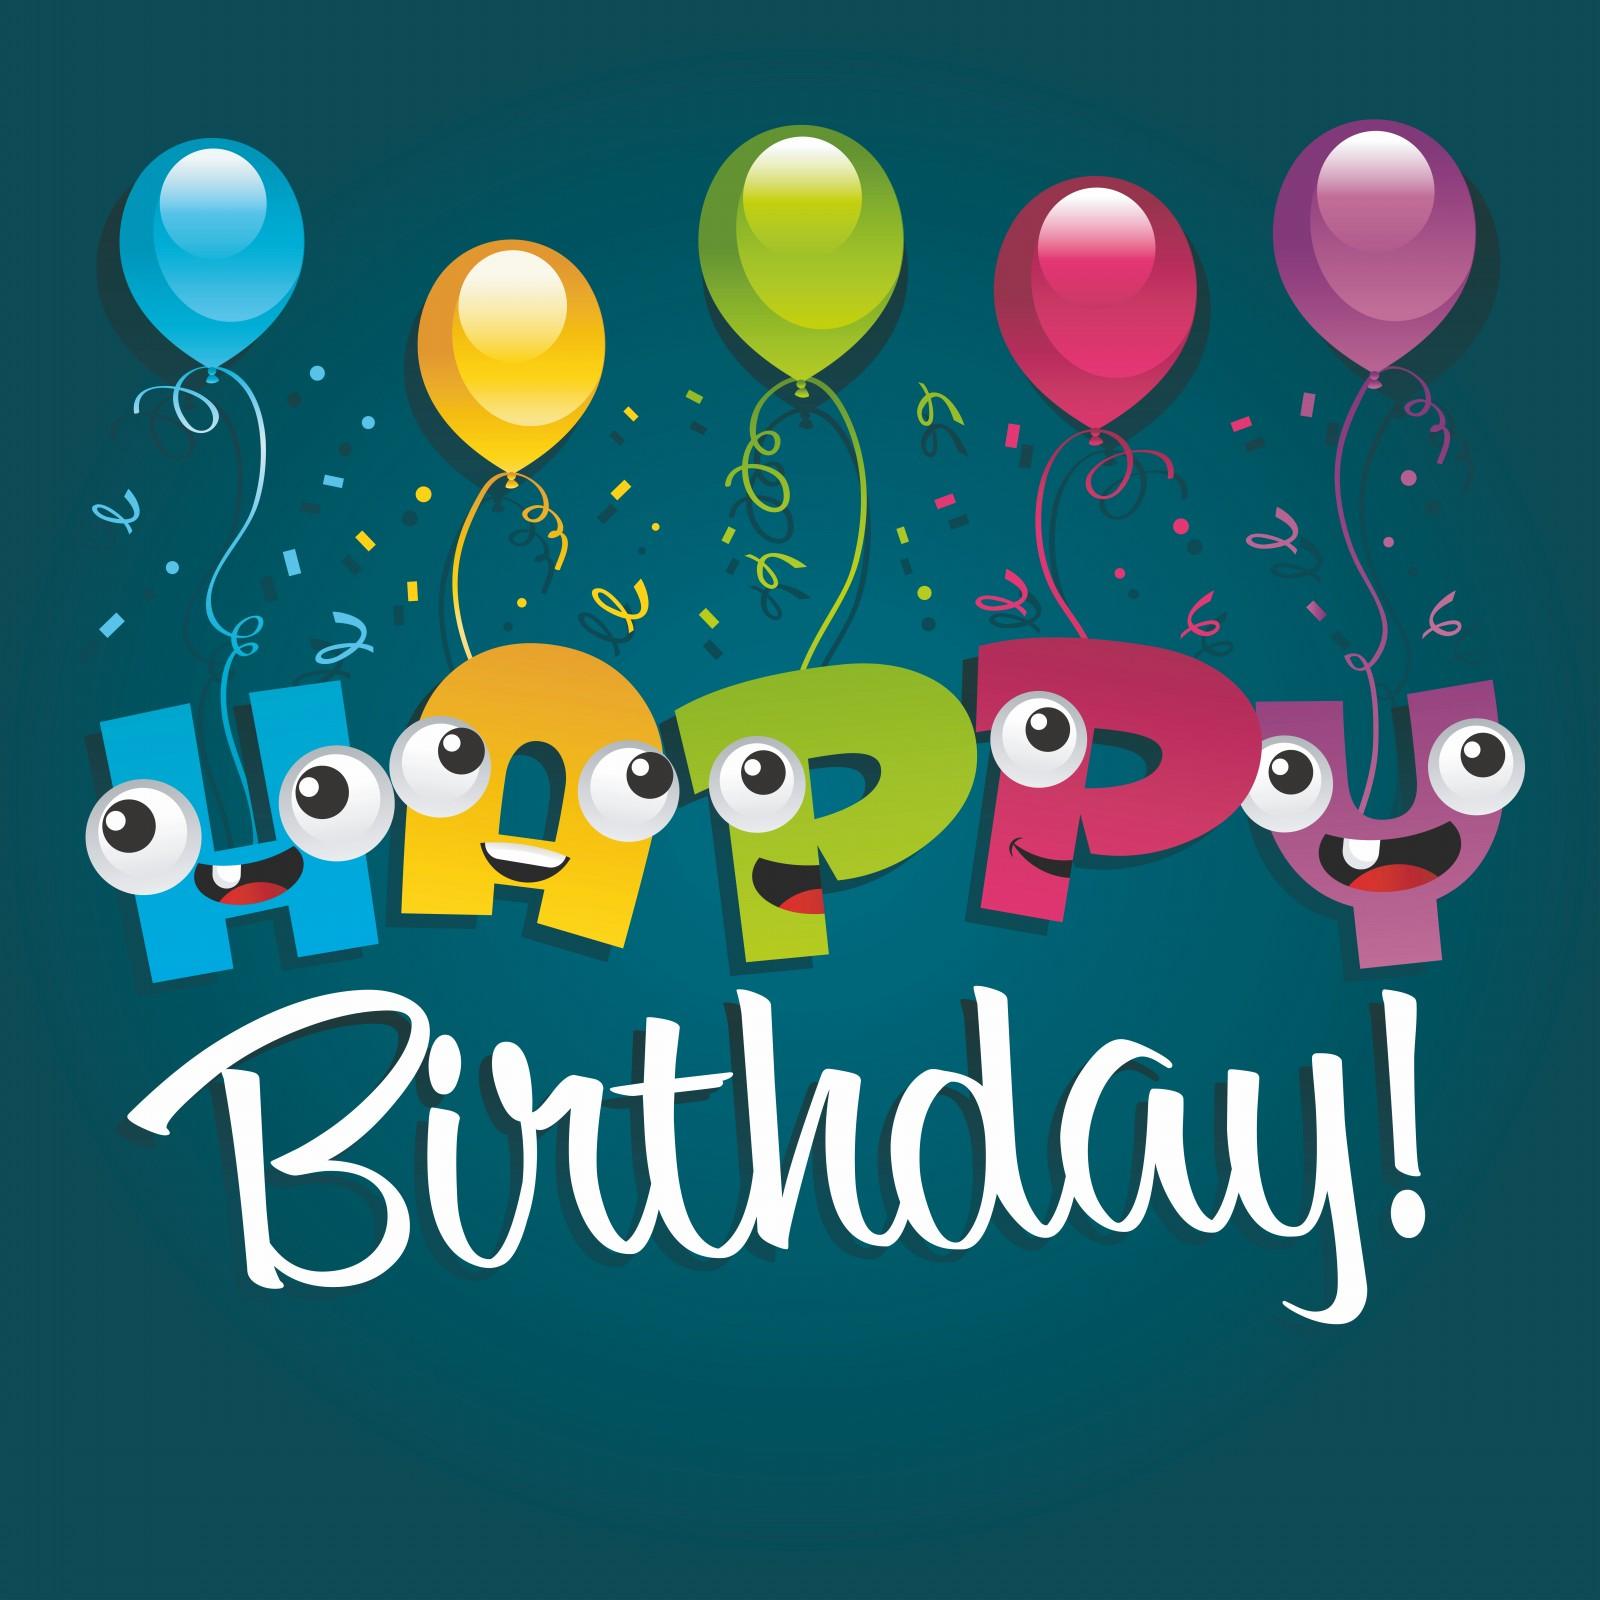 happy birthday card for - photo #13